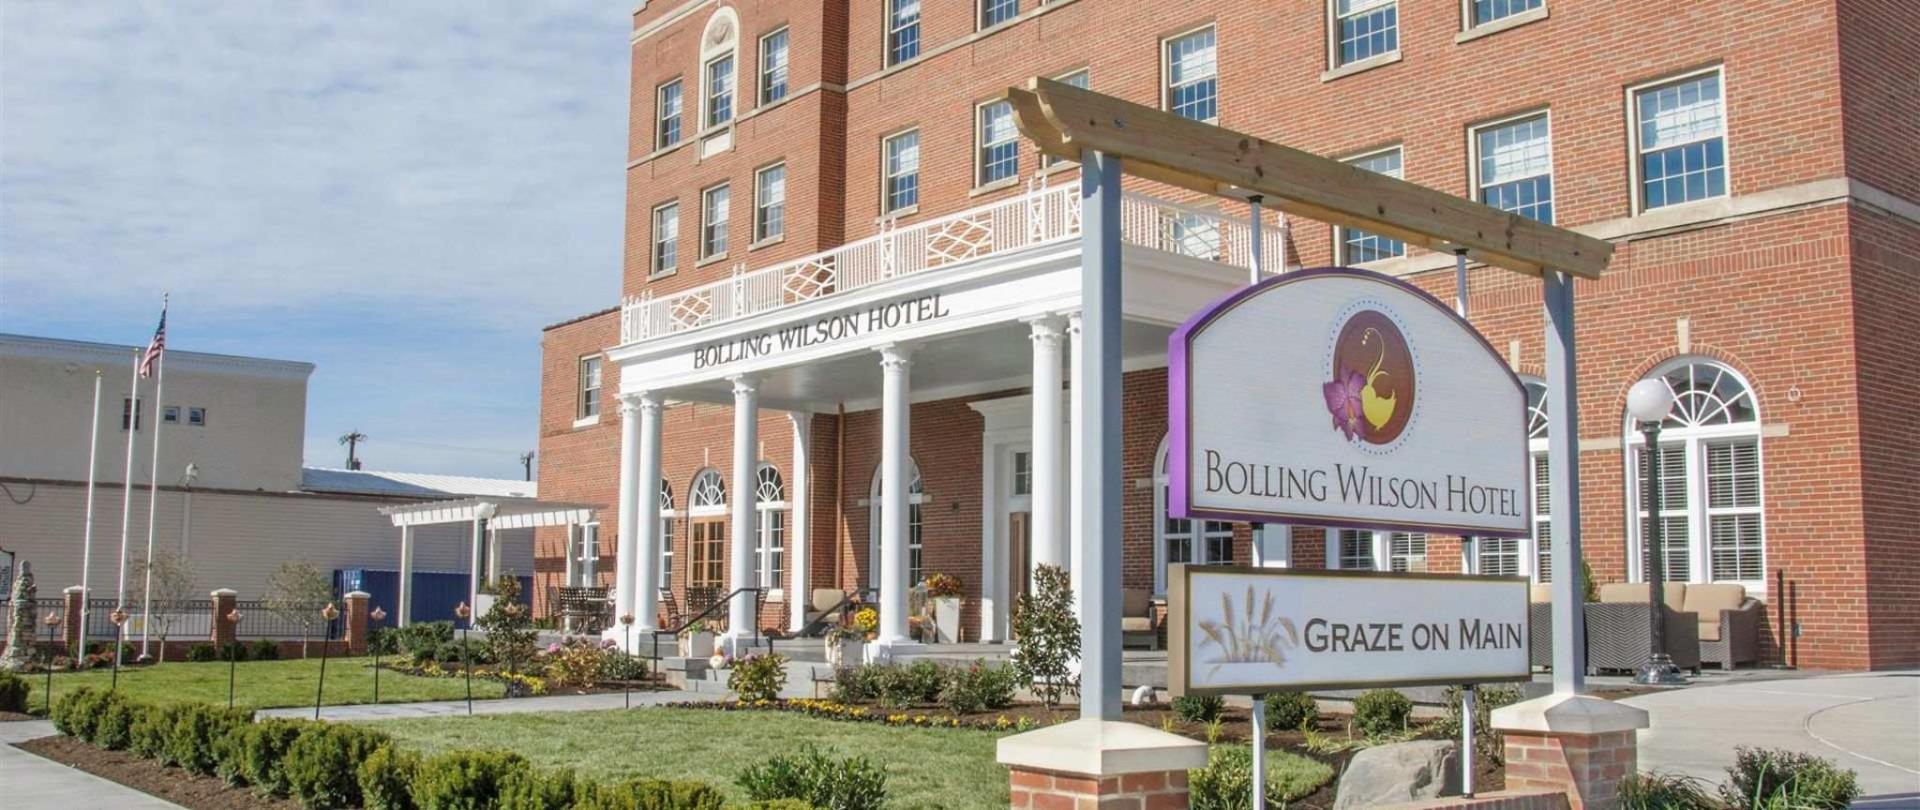 Bolling Wilson Hotel.jpg